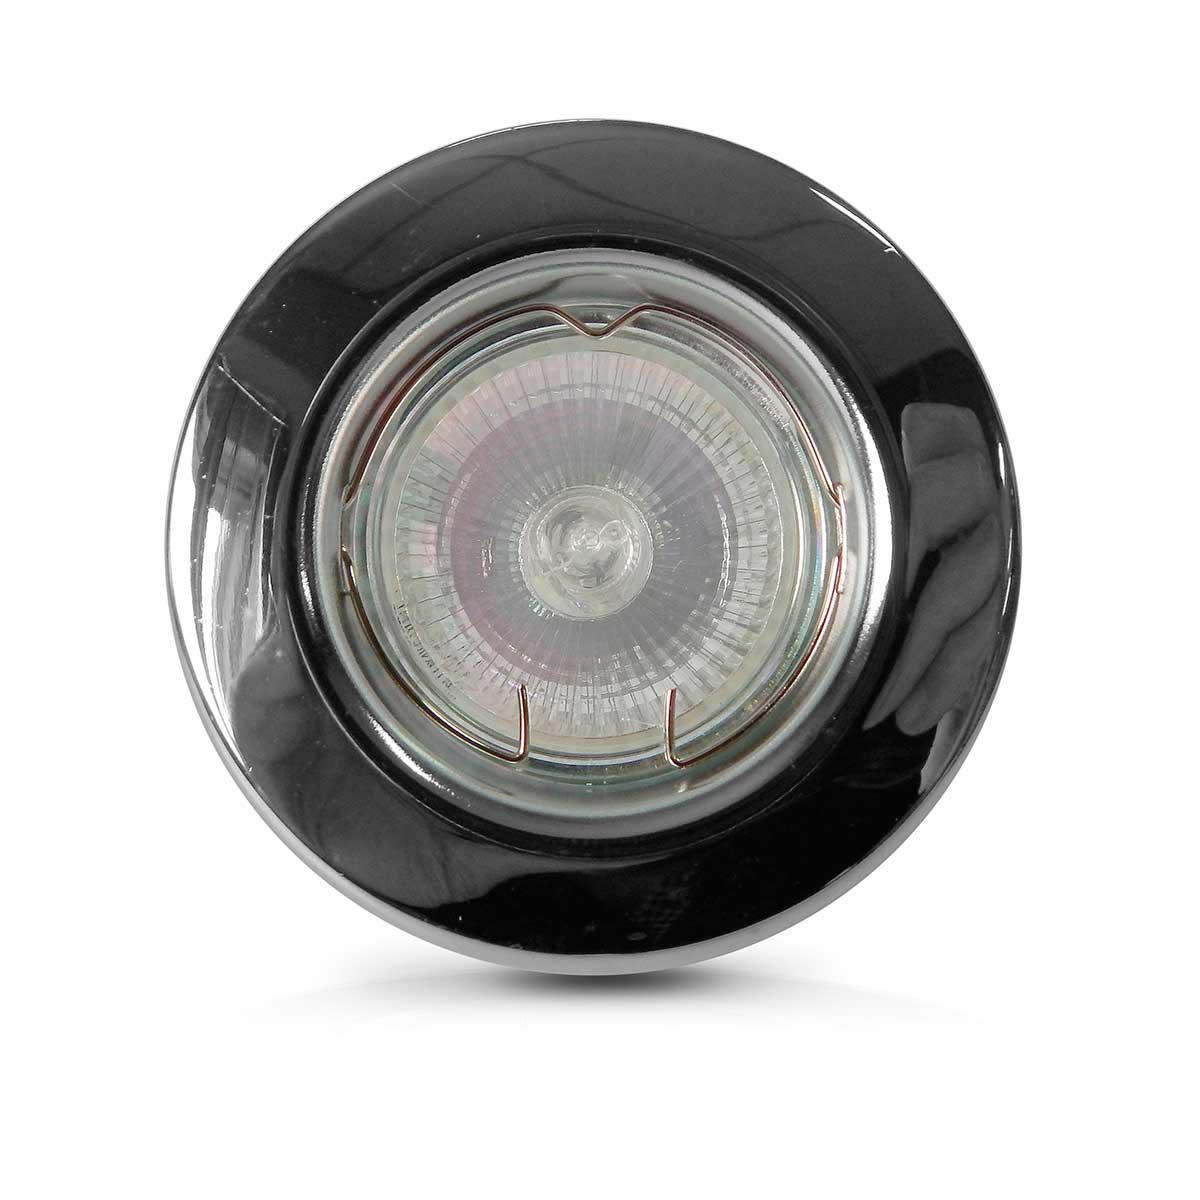 Spot Dicroica Fixo Aco Mr16 (Com Lampada 50w)